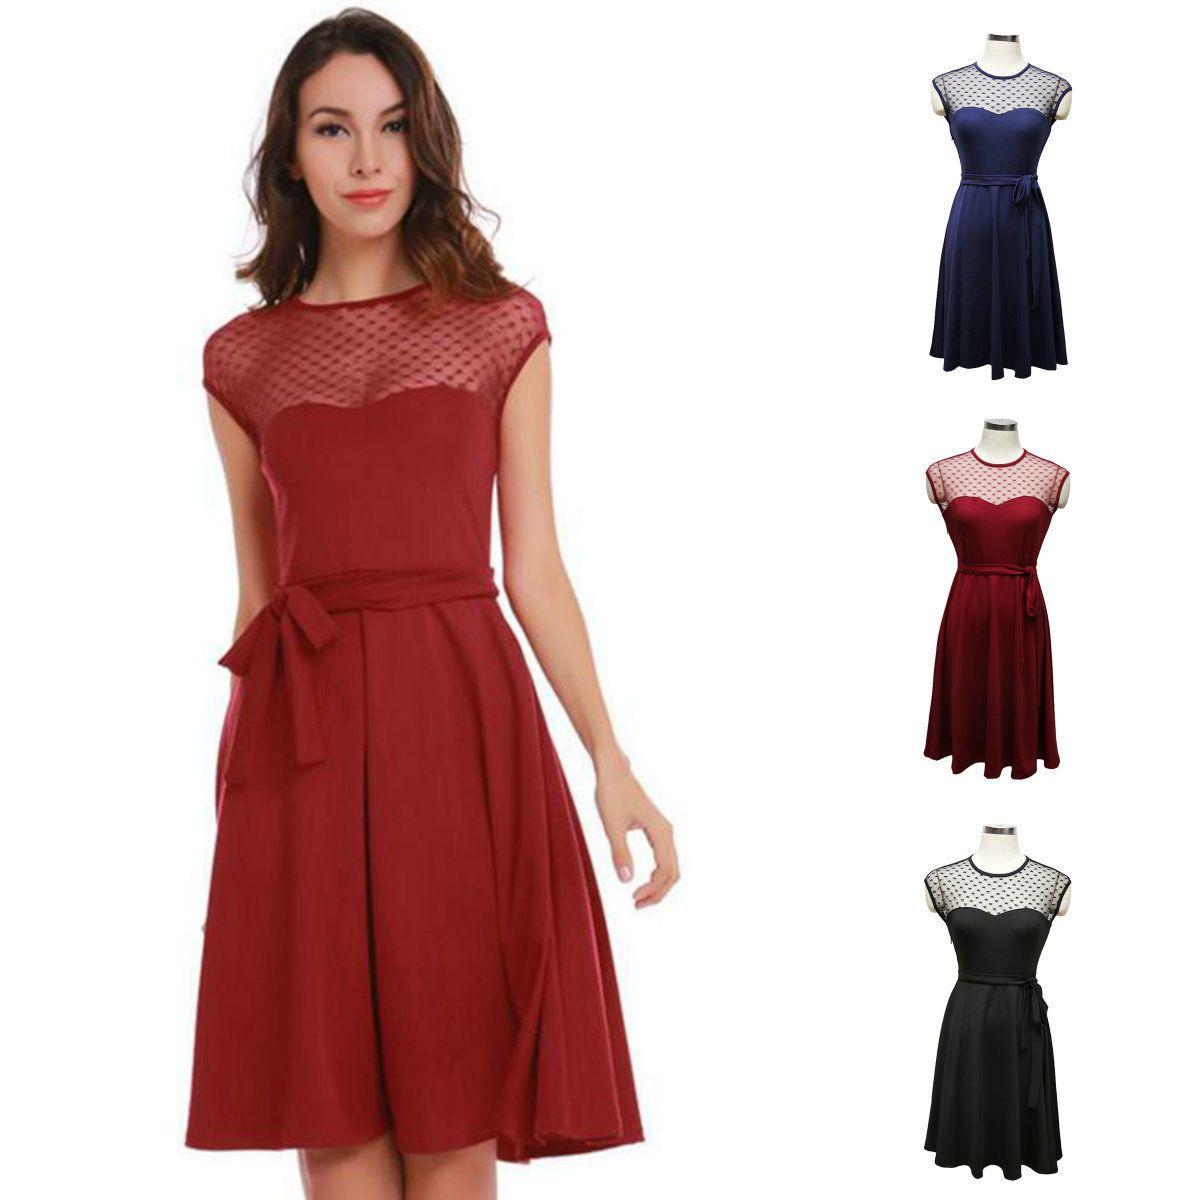 Charm vogue women mesh perspective short sleeve cocktail short skirt